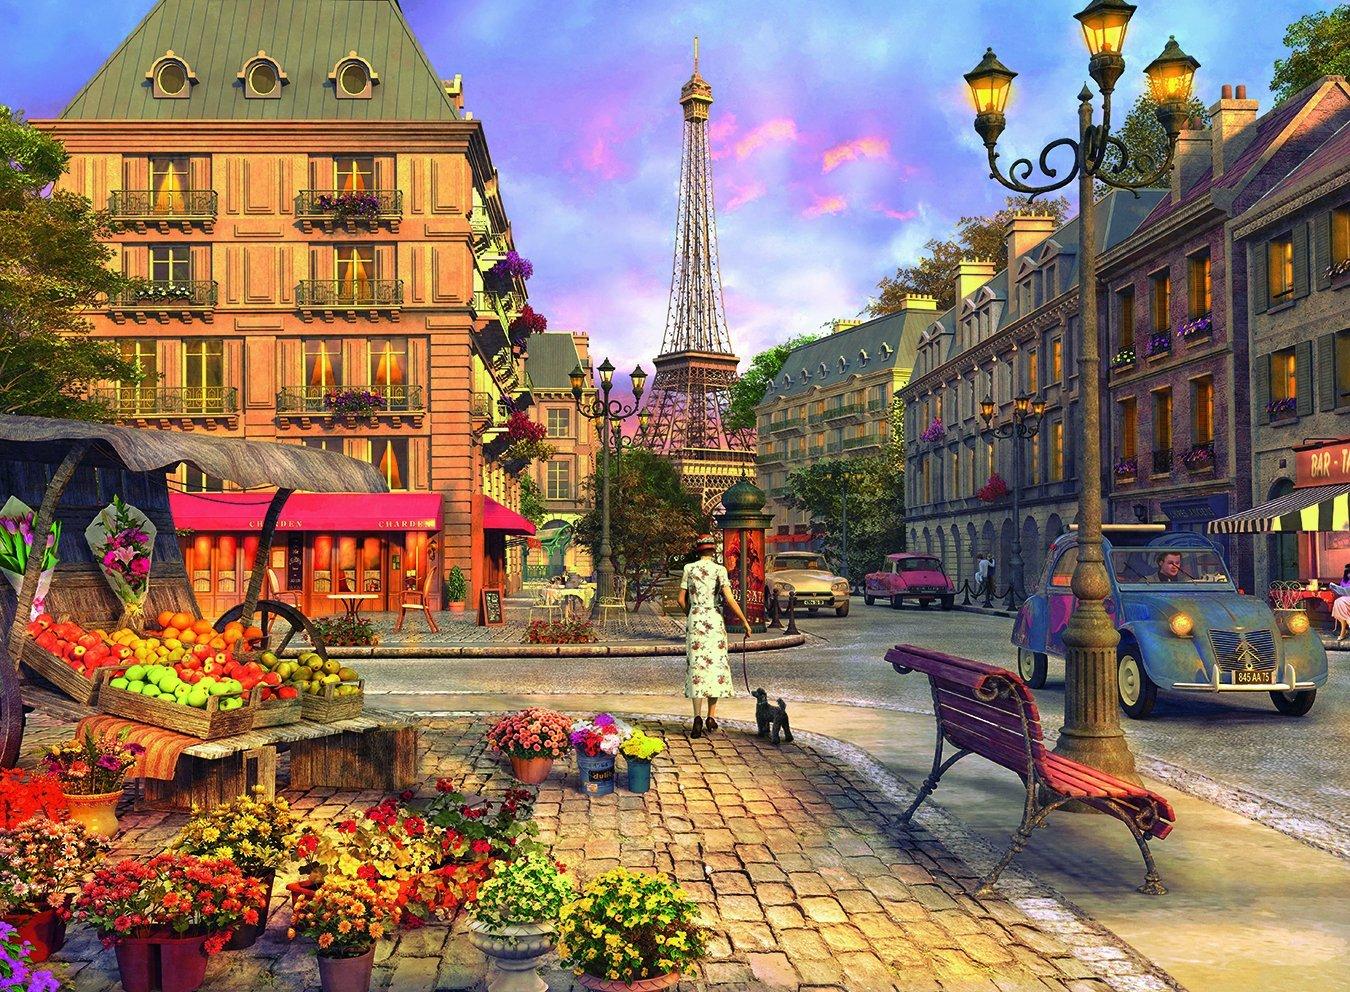 promenade-a-paris